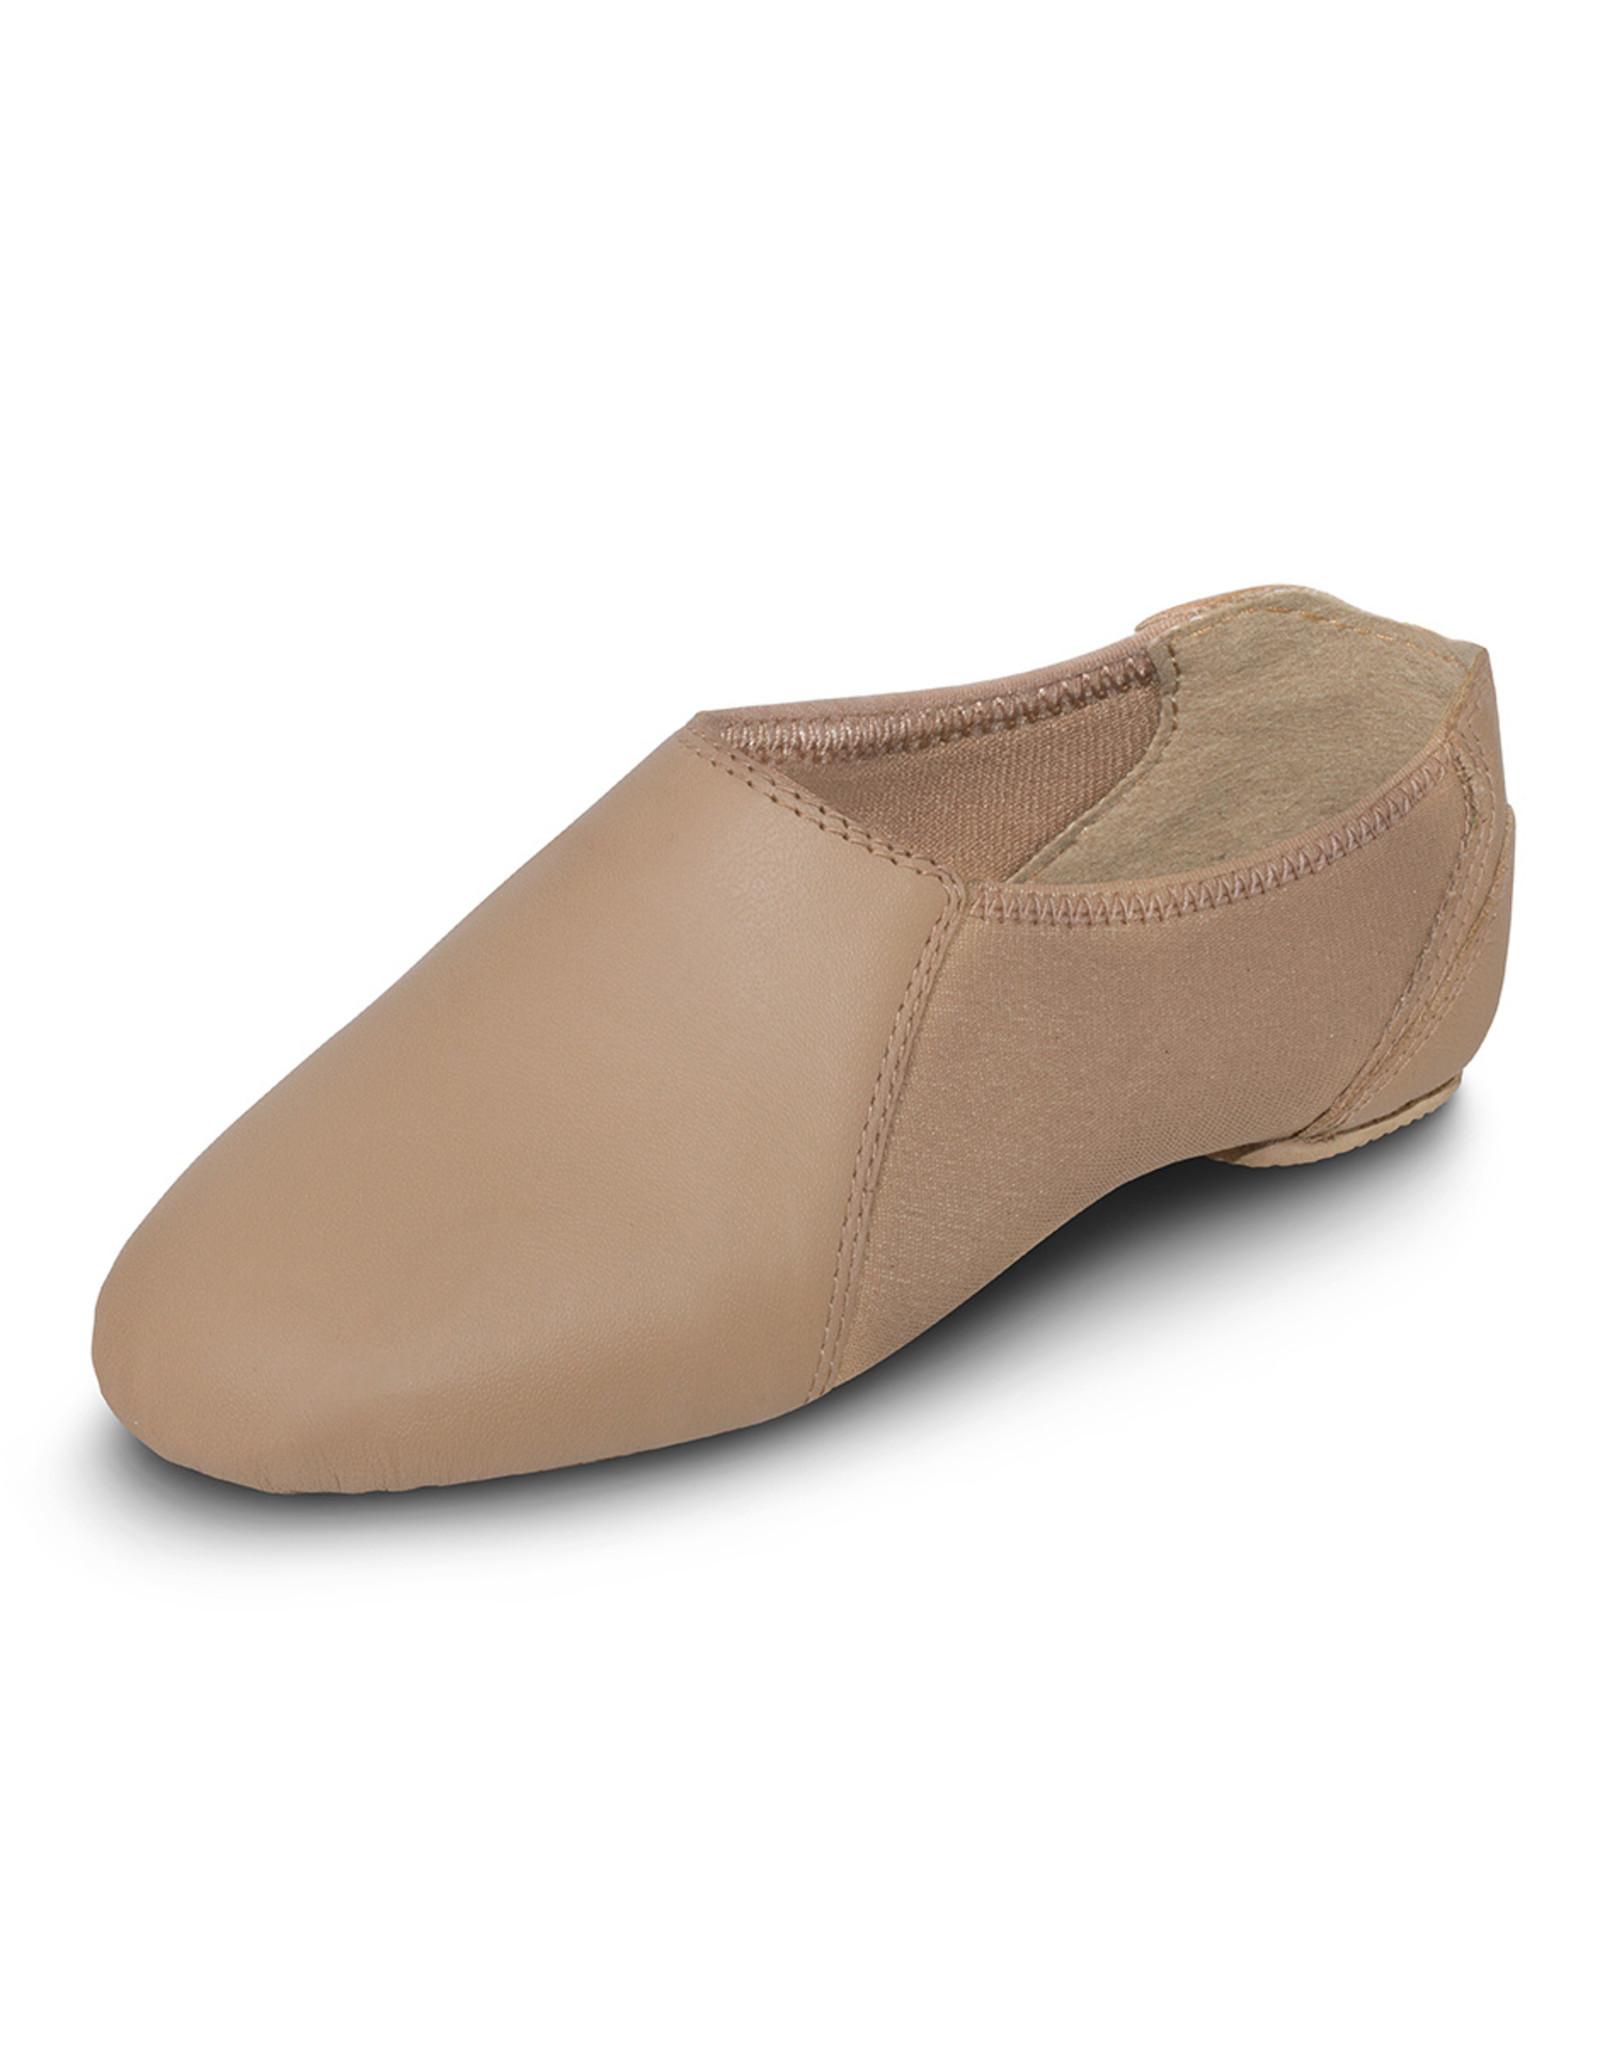 Bloch / Mirella Spark Jazz Shoe (497L)